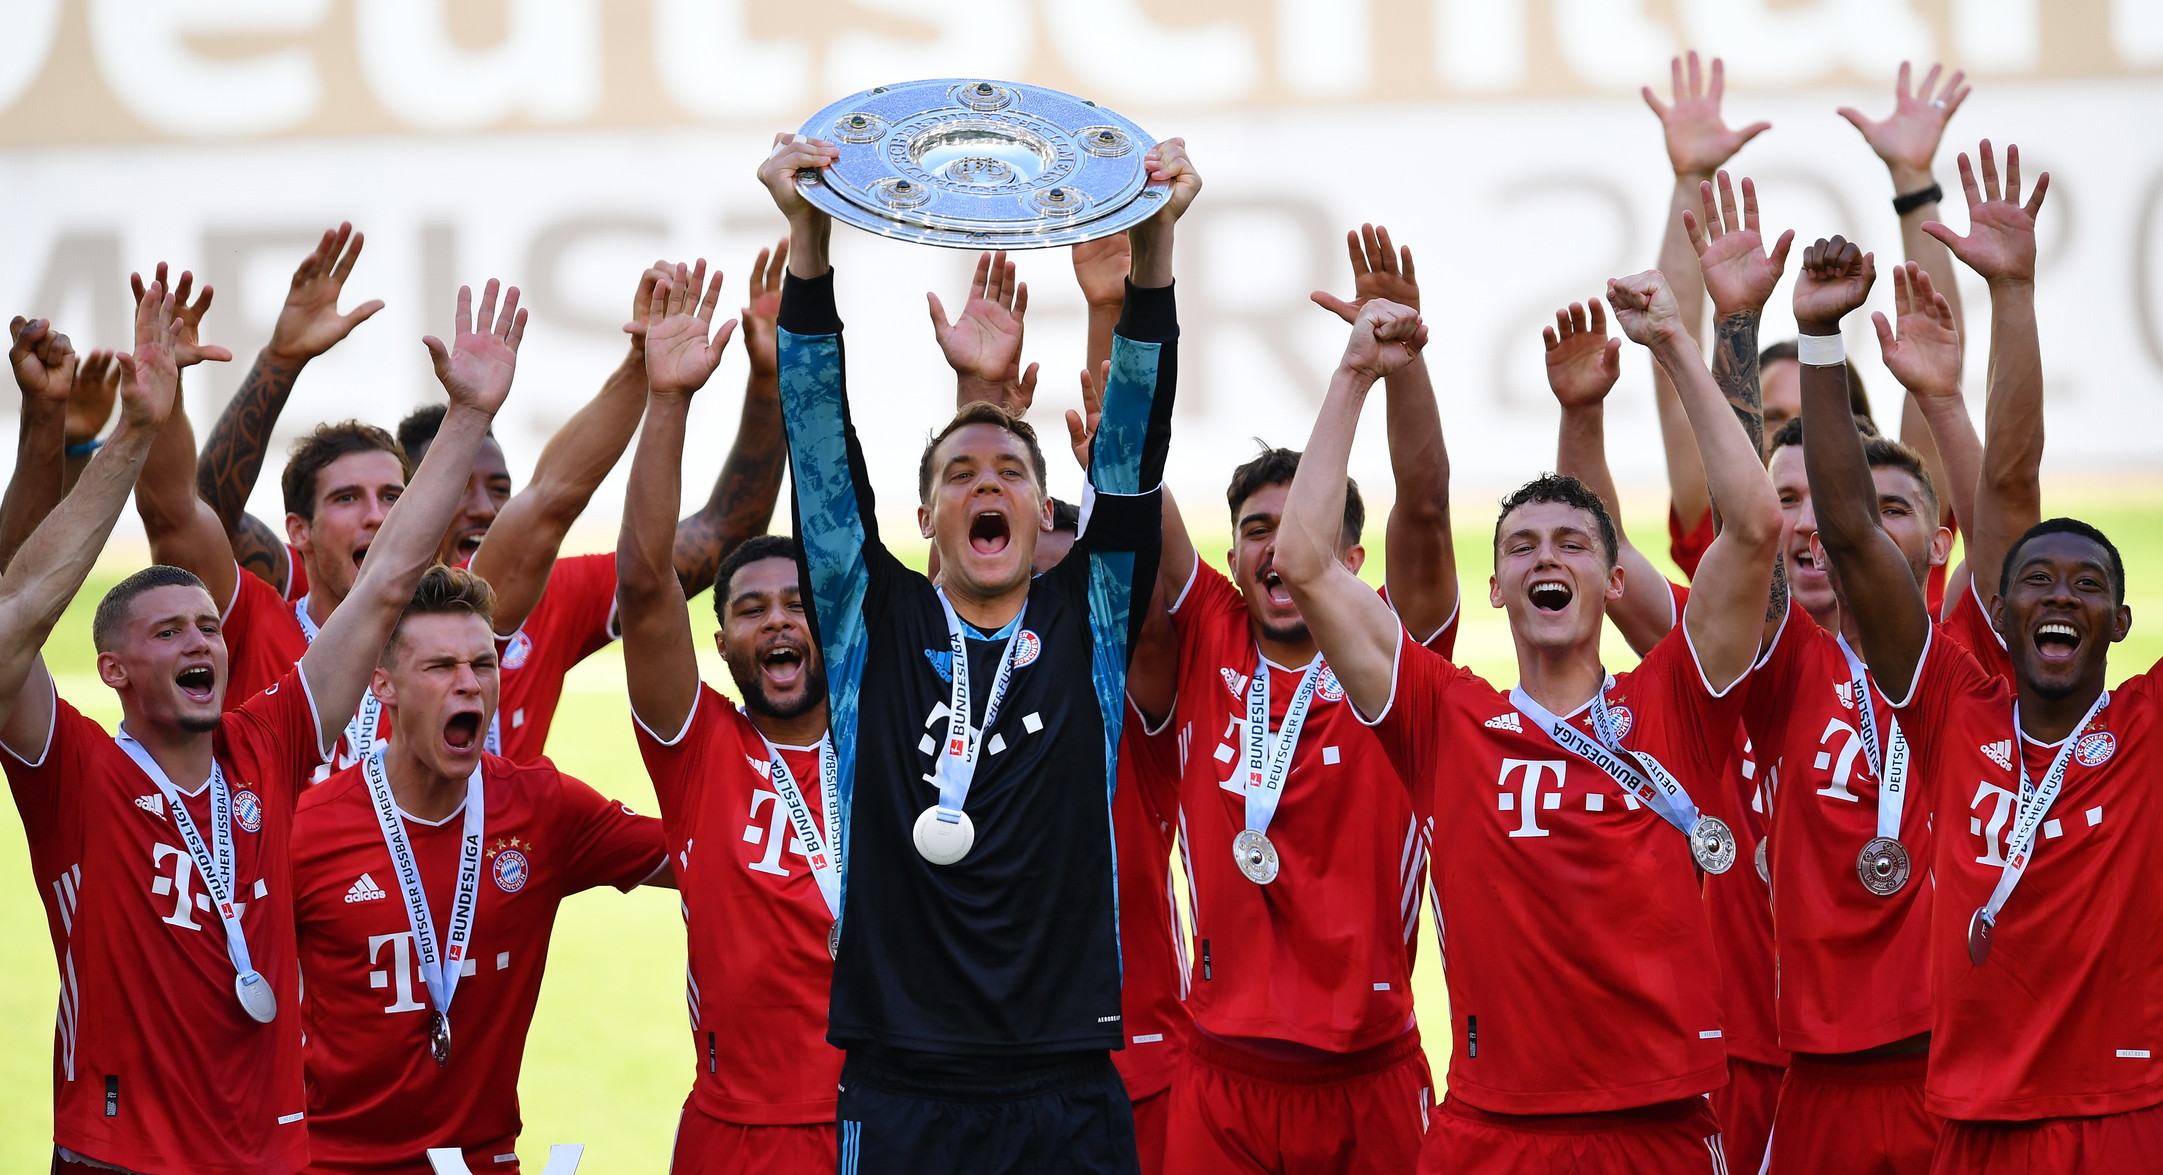 Calcio, Germania: Bundesliga-Bayern Monaco; Coppa di Germania: Bayern Monaco; Supercoppa tedesca: Bayern Monaco